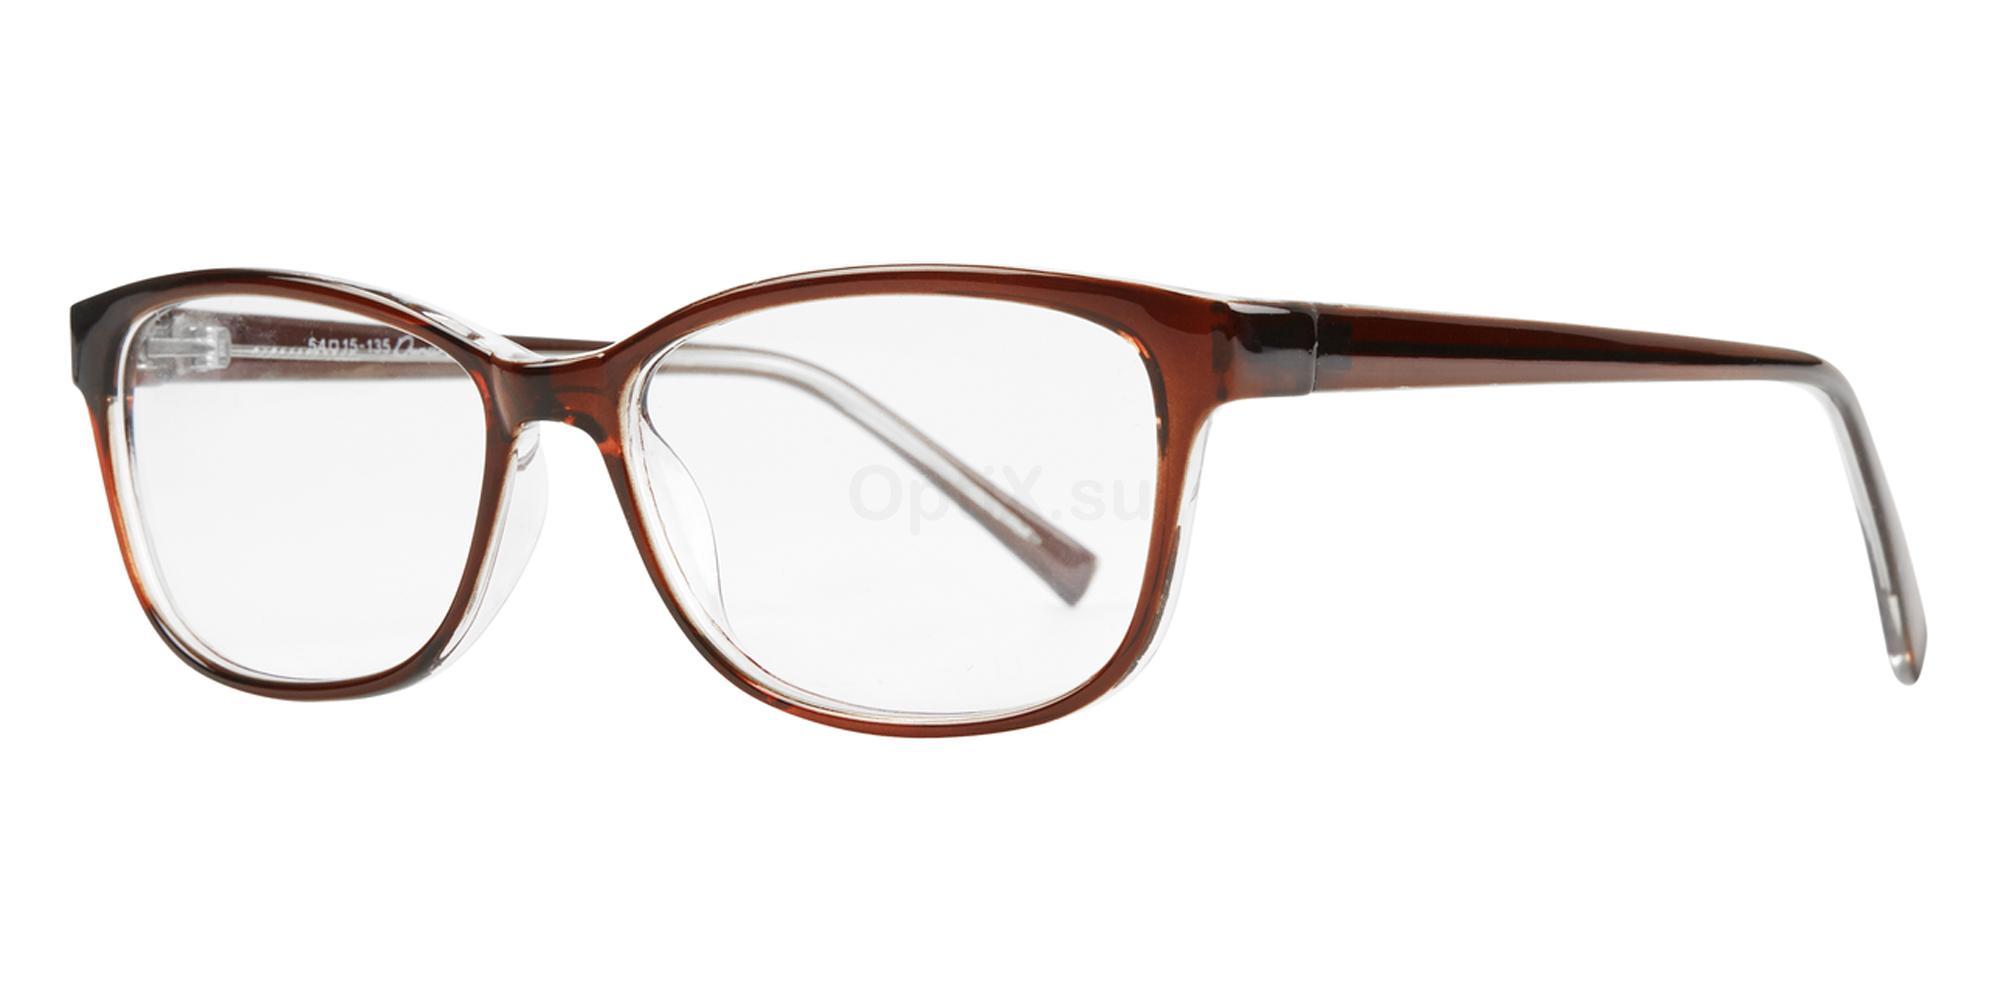 C1 Complete Mod 6 Glasses, Complete